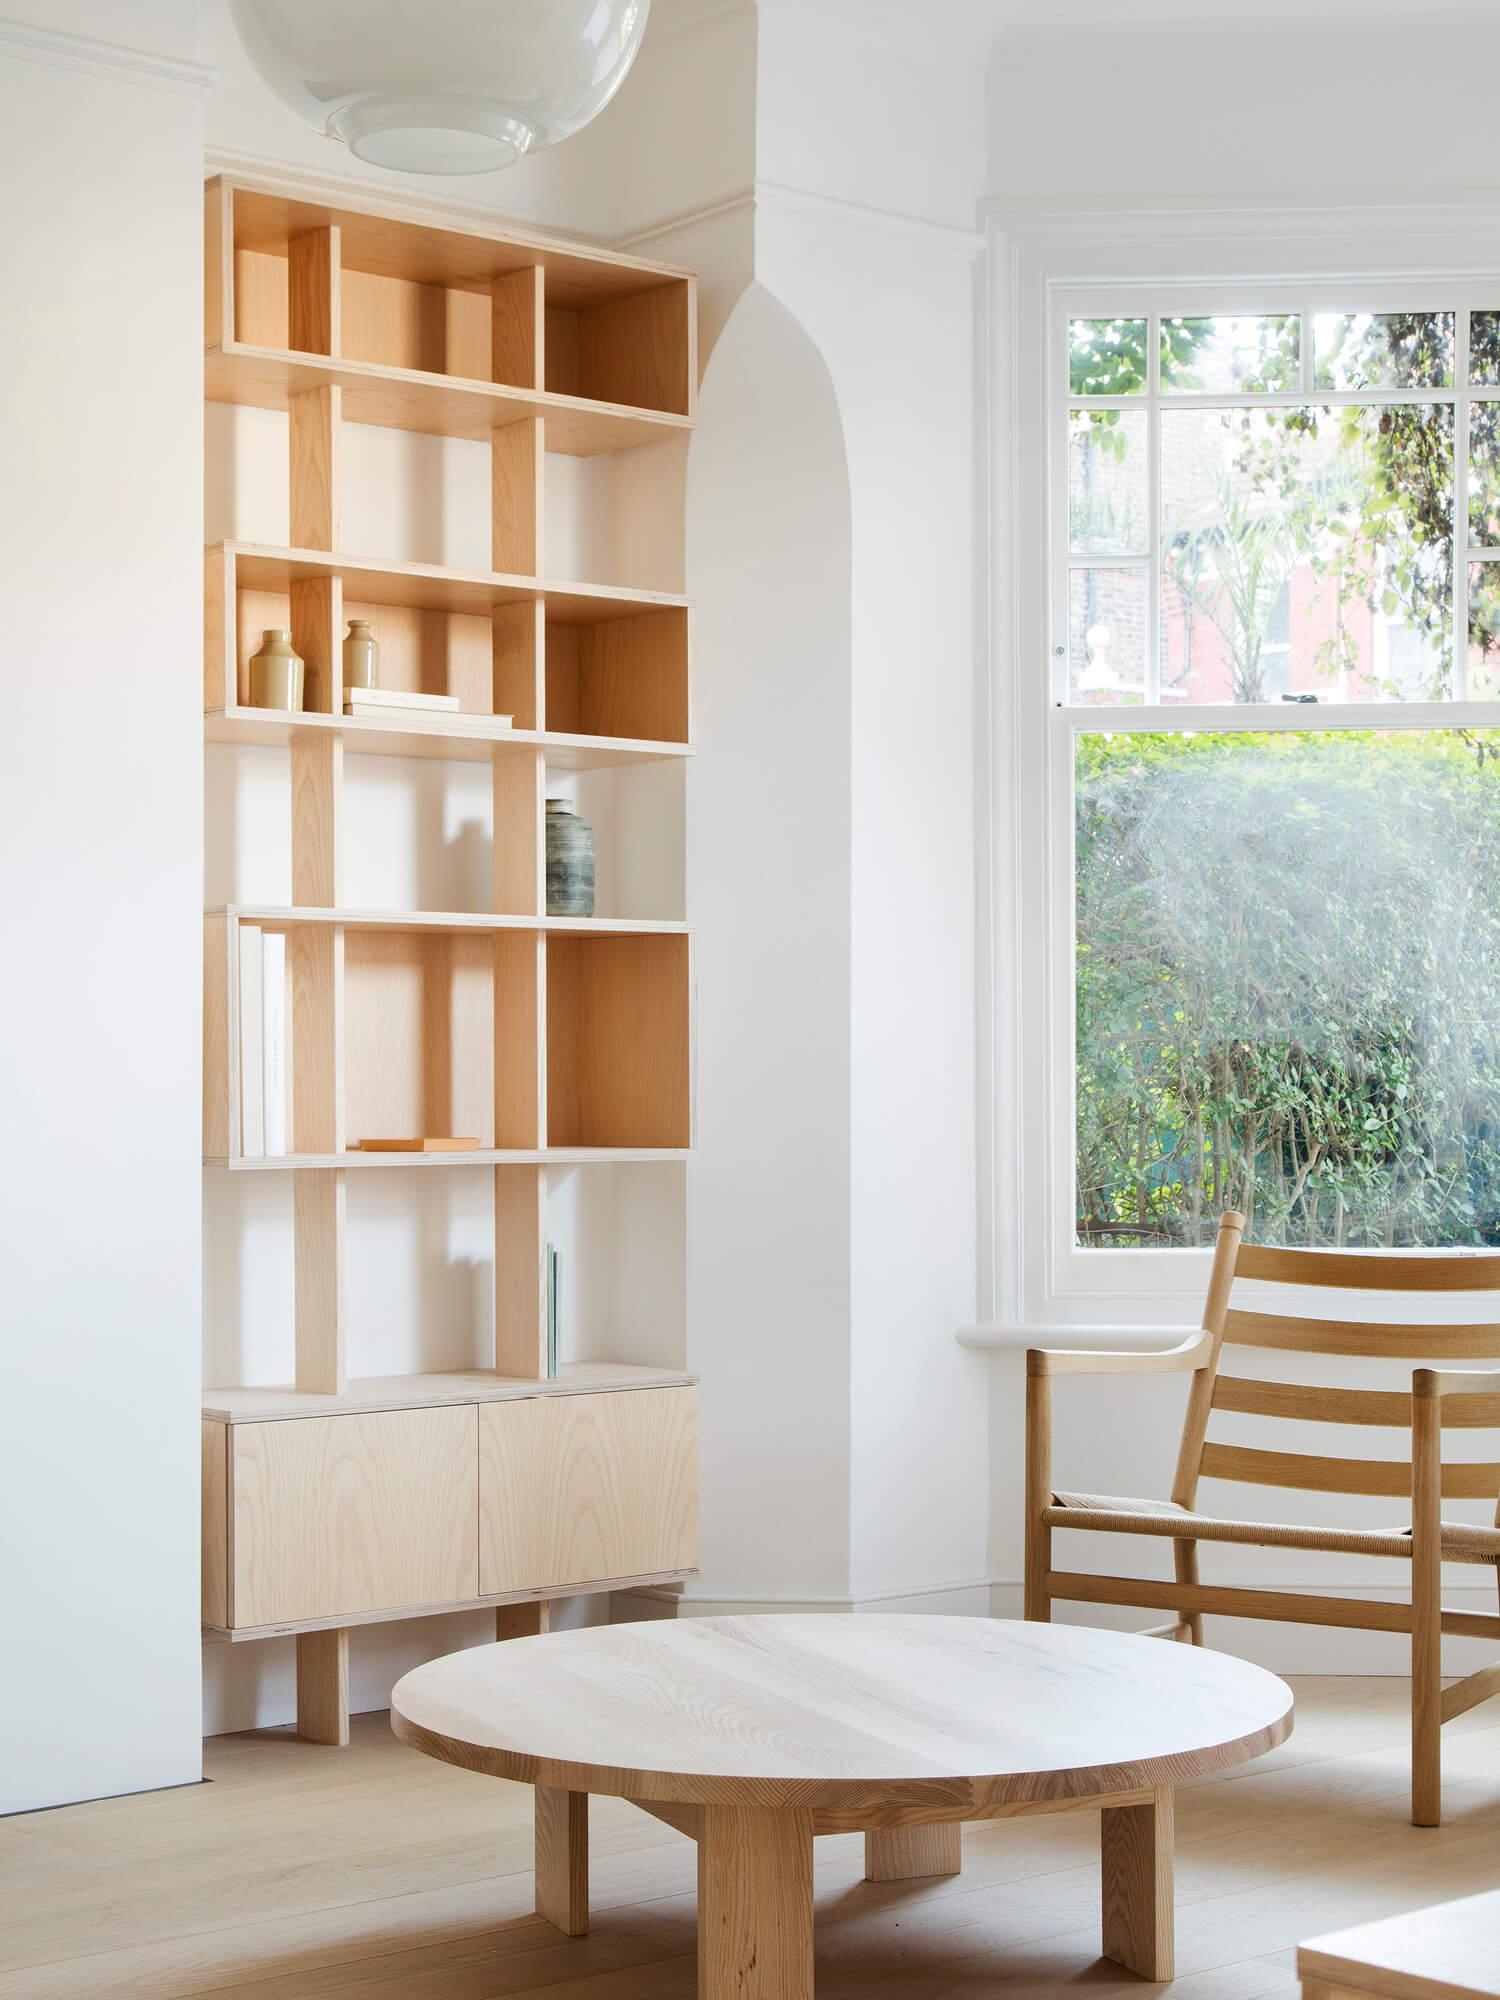 est living dewsbury road o sullivan architects 05